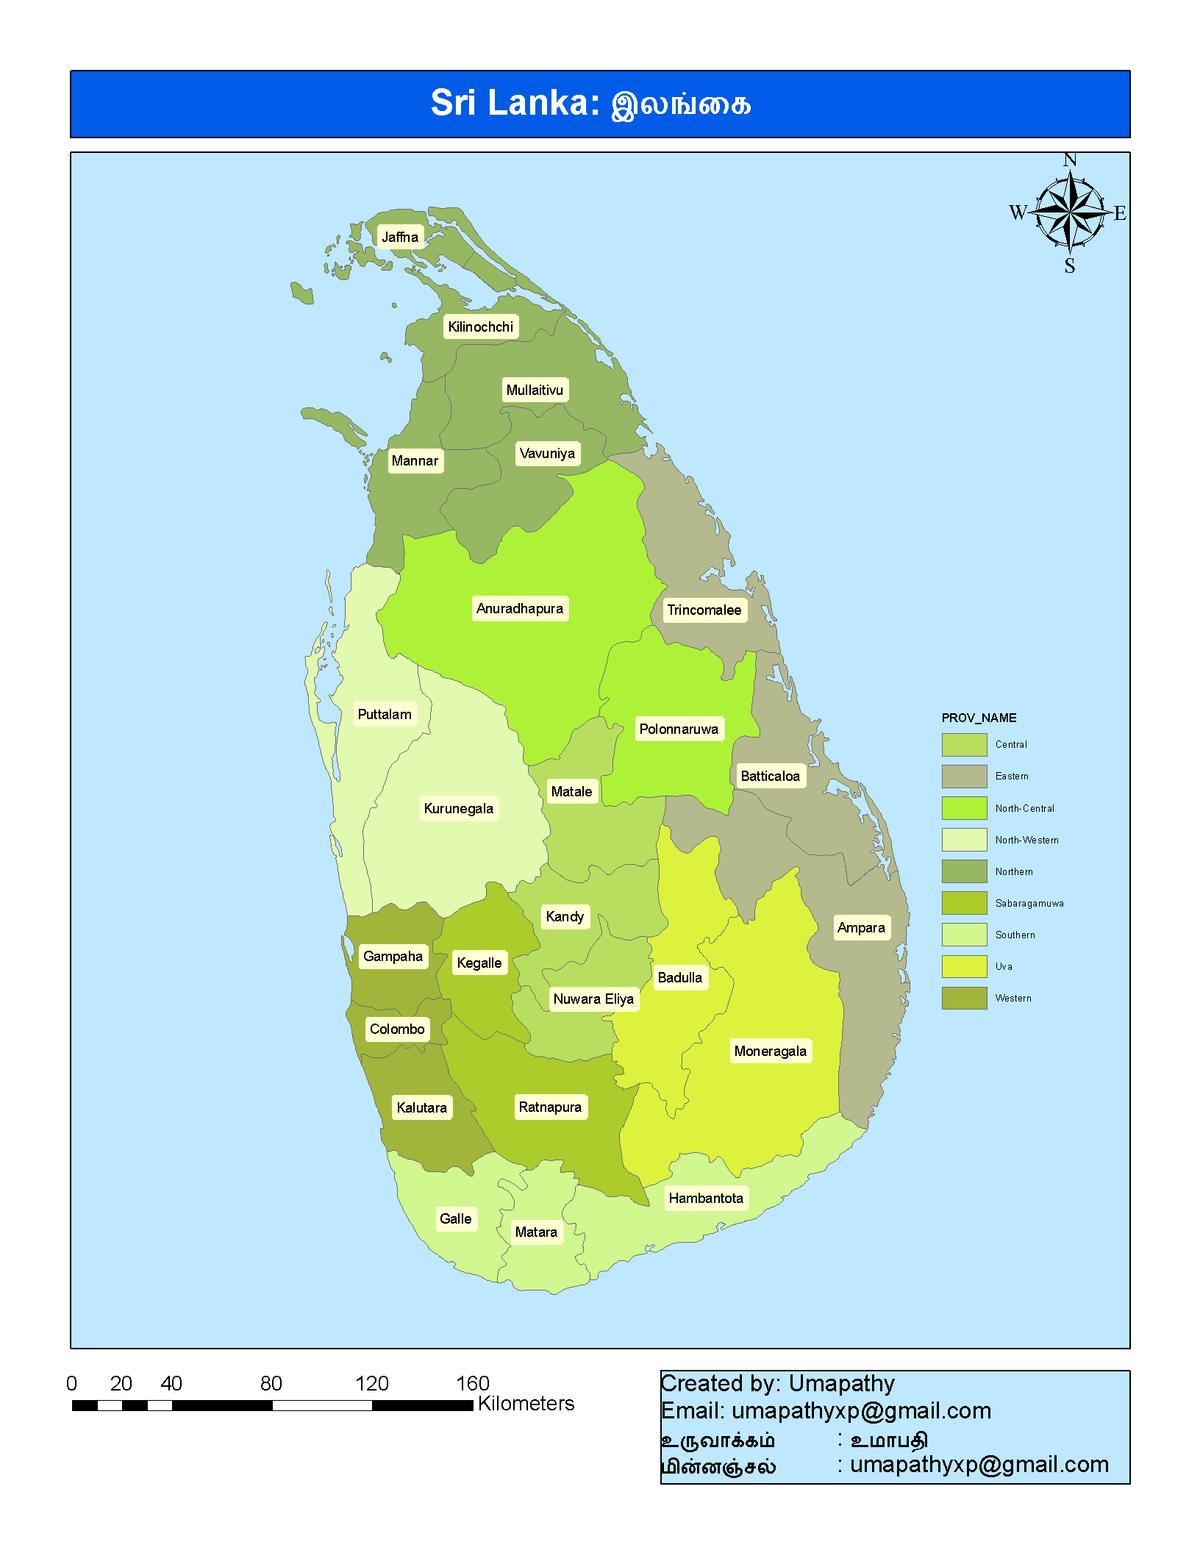 Bestuurlijke indeling van sri lanka wikipedia - Sri lankan passport office in colombo ...